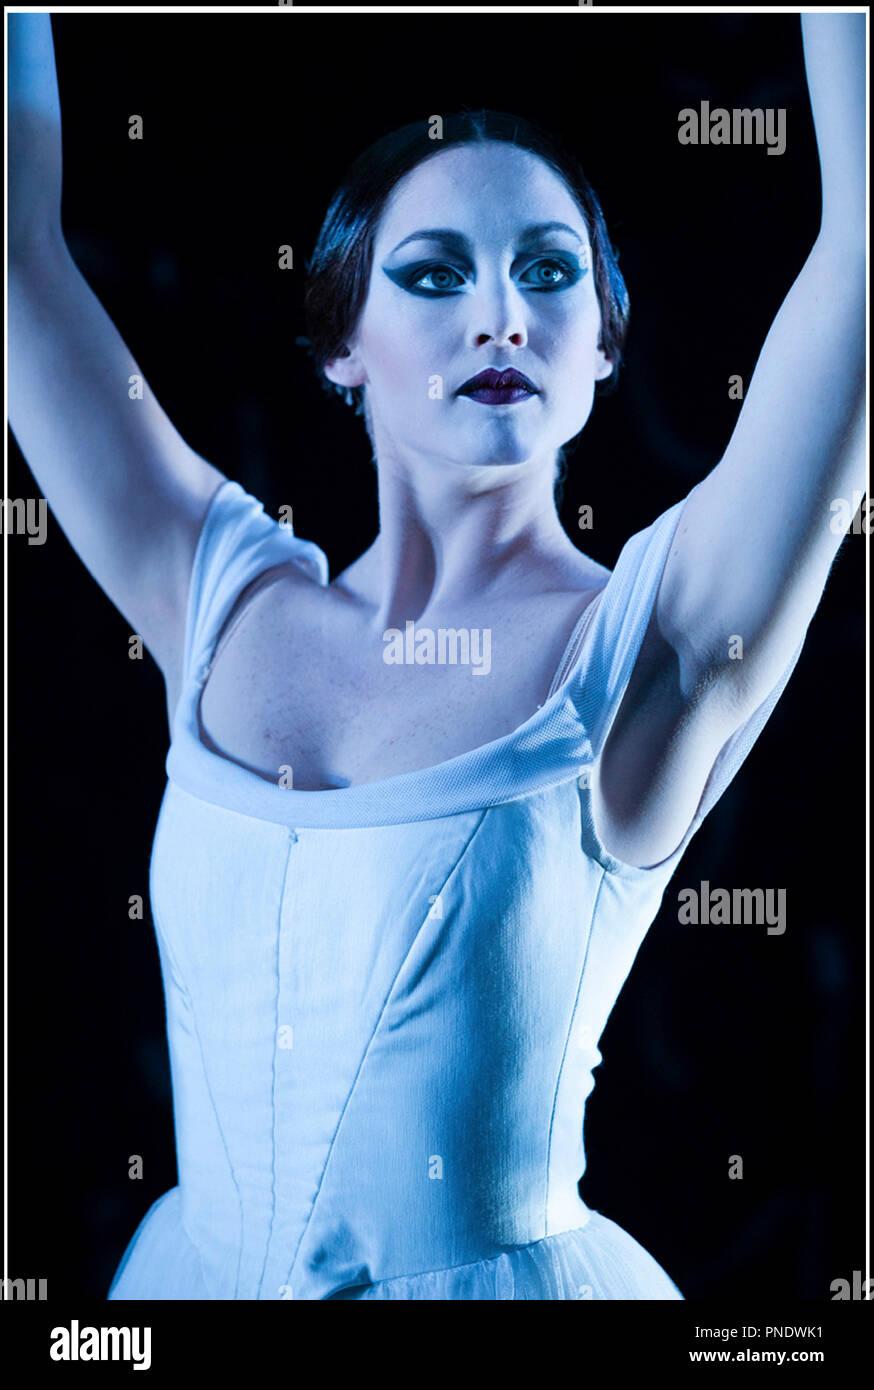 Prod DB © M. Klitscher - General Film Corporation / DR GISELLE de Toa Fraser 2014 NZ avec Gillan Murphy ballet, danse classique - Stock Image